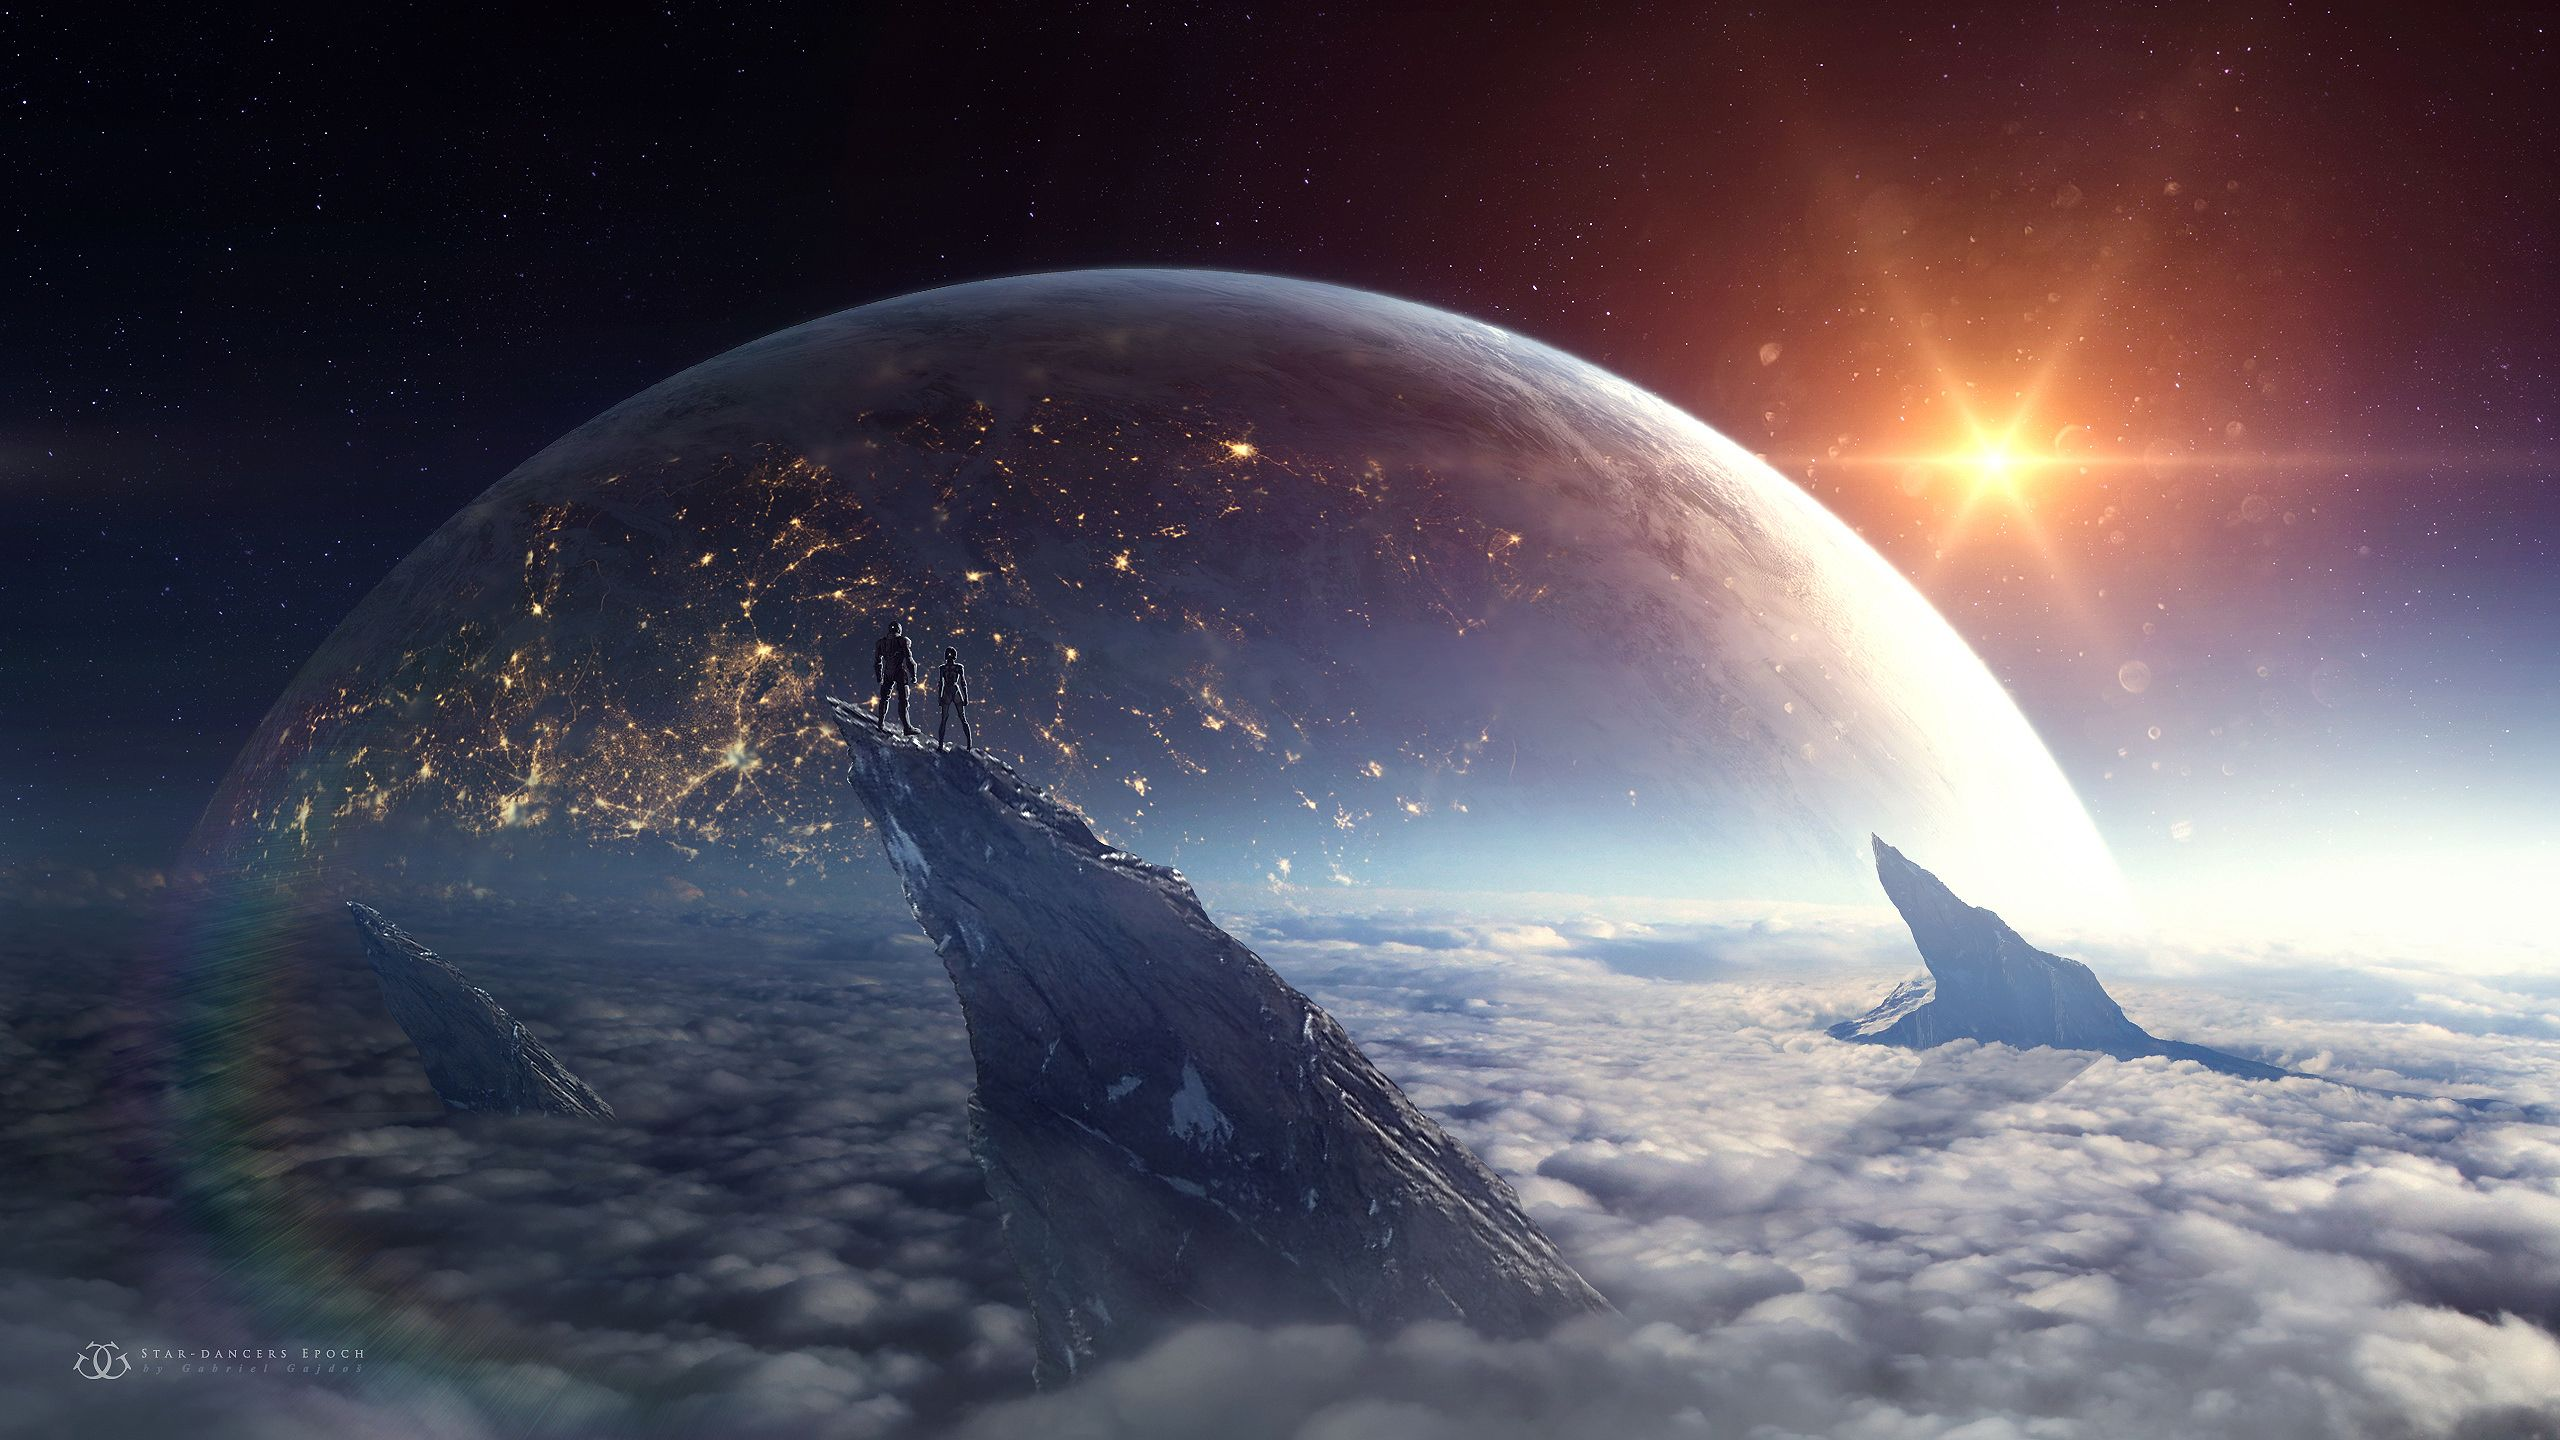 Rising Planet 2560x1440 Fond Ecran Smartphone Cyberpunk